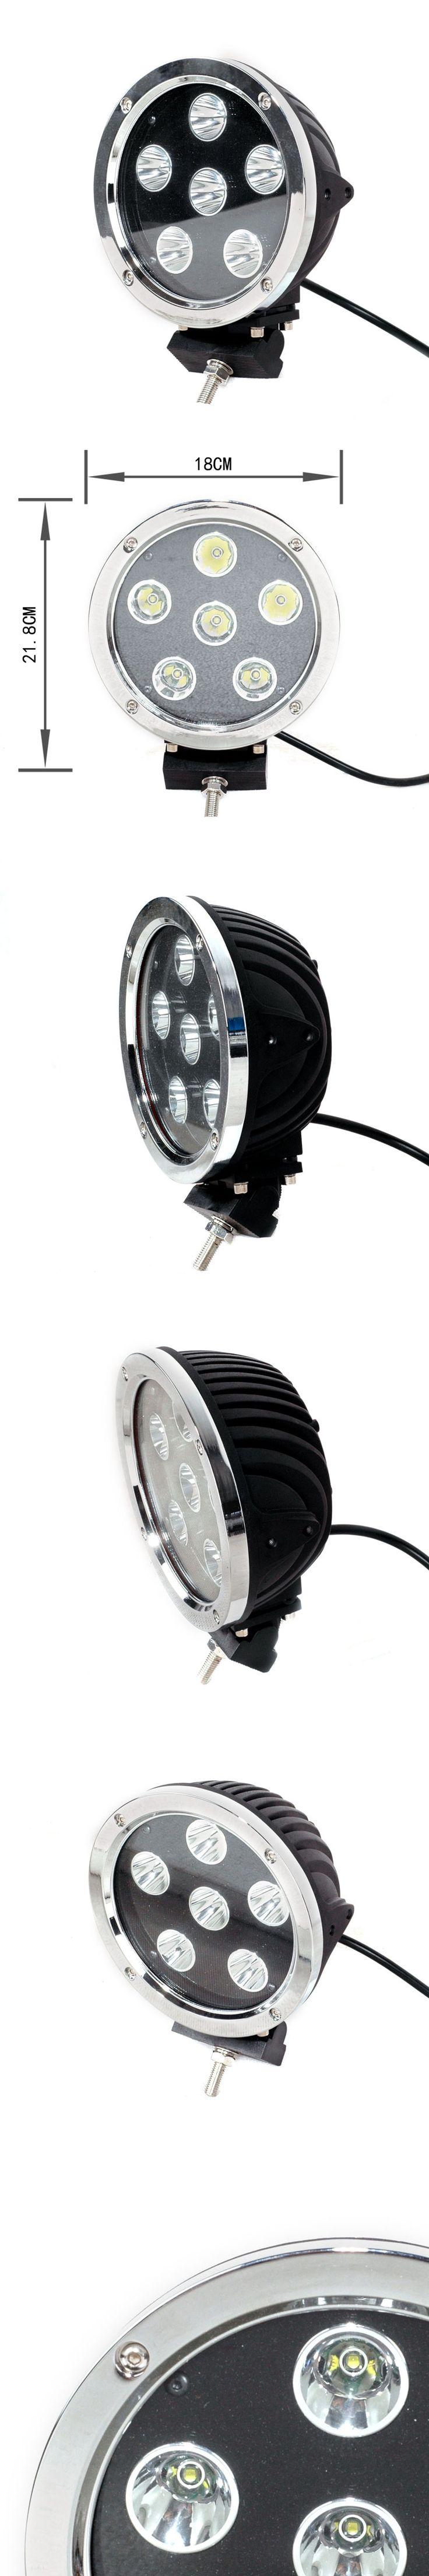 The 33 Best Led Headlight Kits Images On Pinterest Headlights Lamp Lightings Gt Wholesale Lamps 5mm Leds Czg 7602c 7 Inch Round Work Light 60w Silver Flood